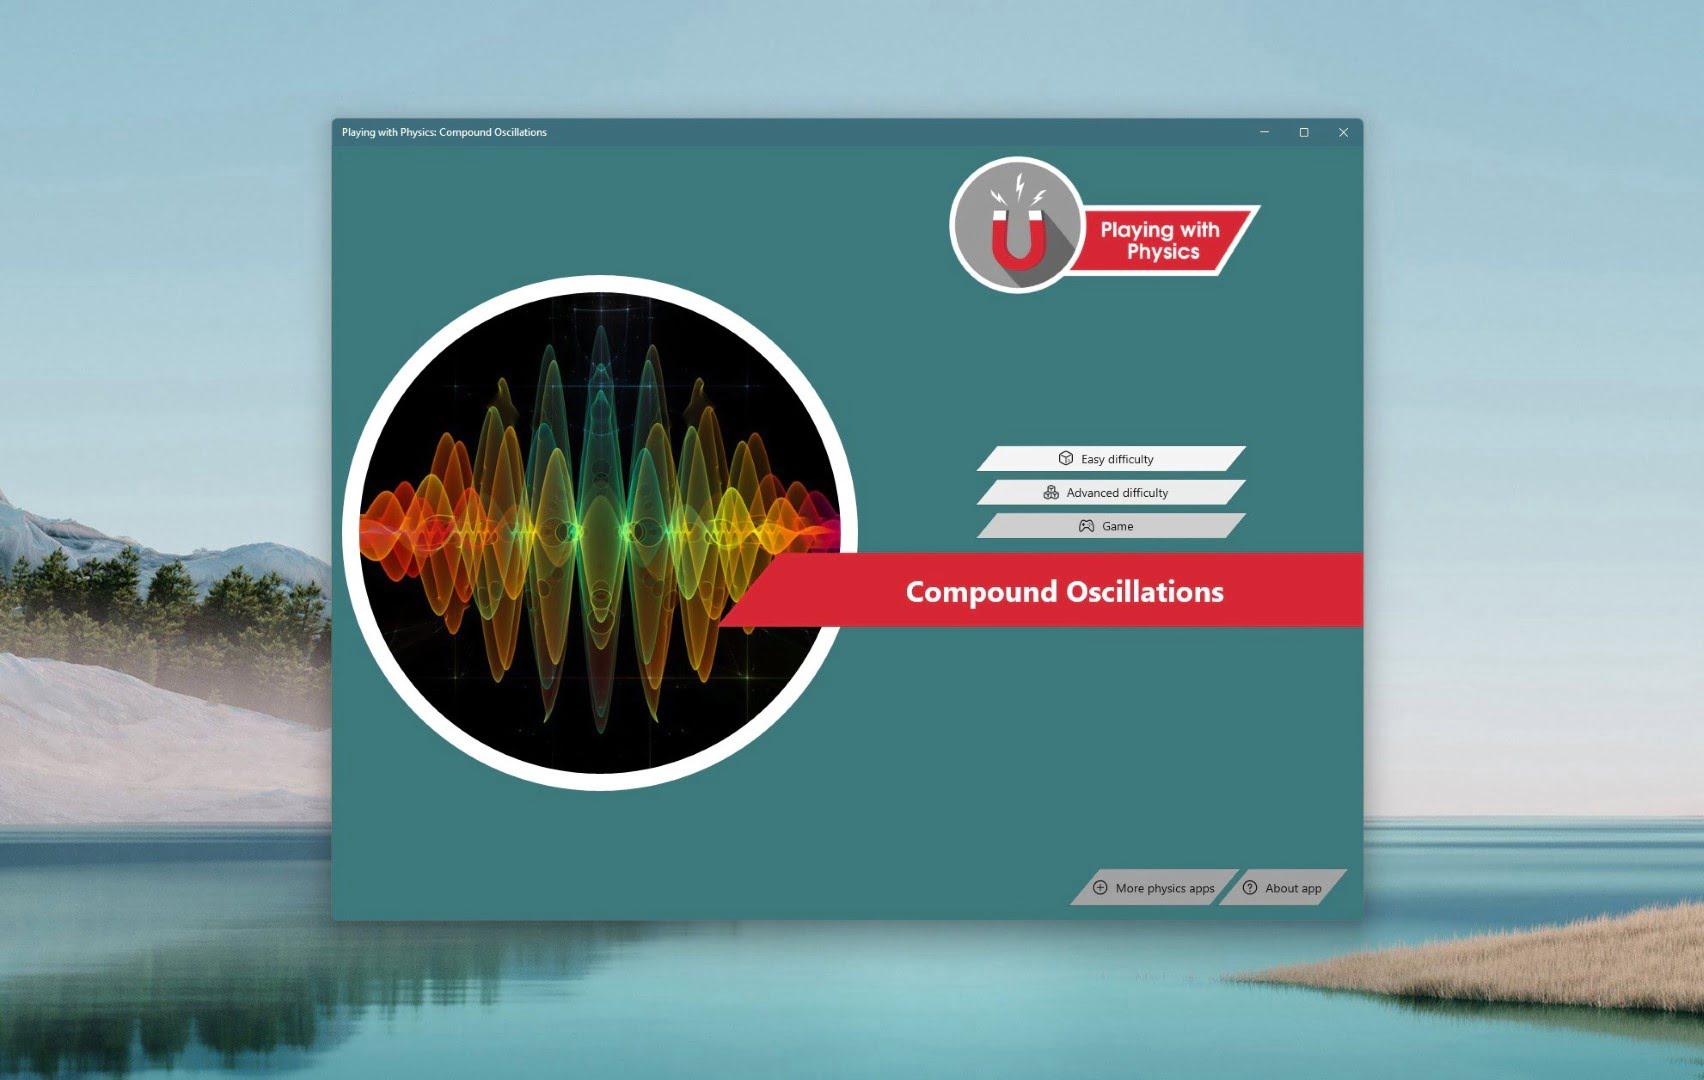 Playing with Physics Compound Oscillations - App per Windows - Render di oscillazioni multiple